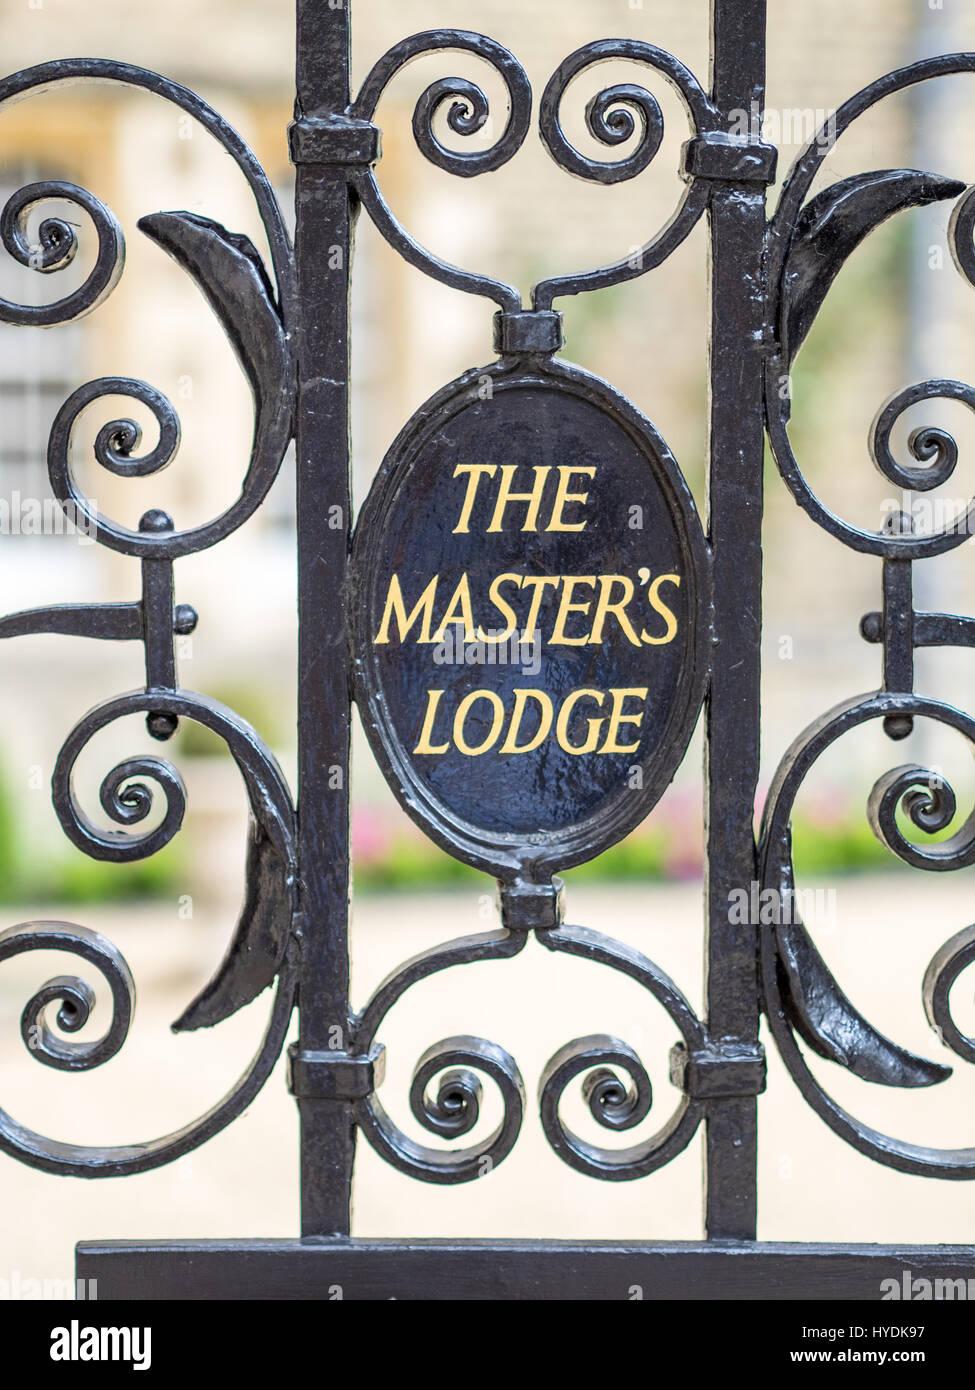 Gate to the Master's Lodge at Jesus College Cambridge UK Stock Photo